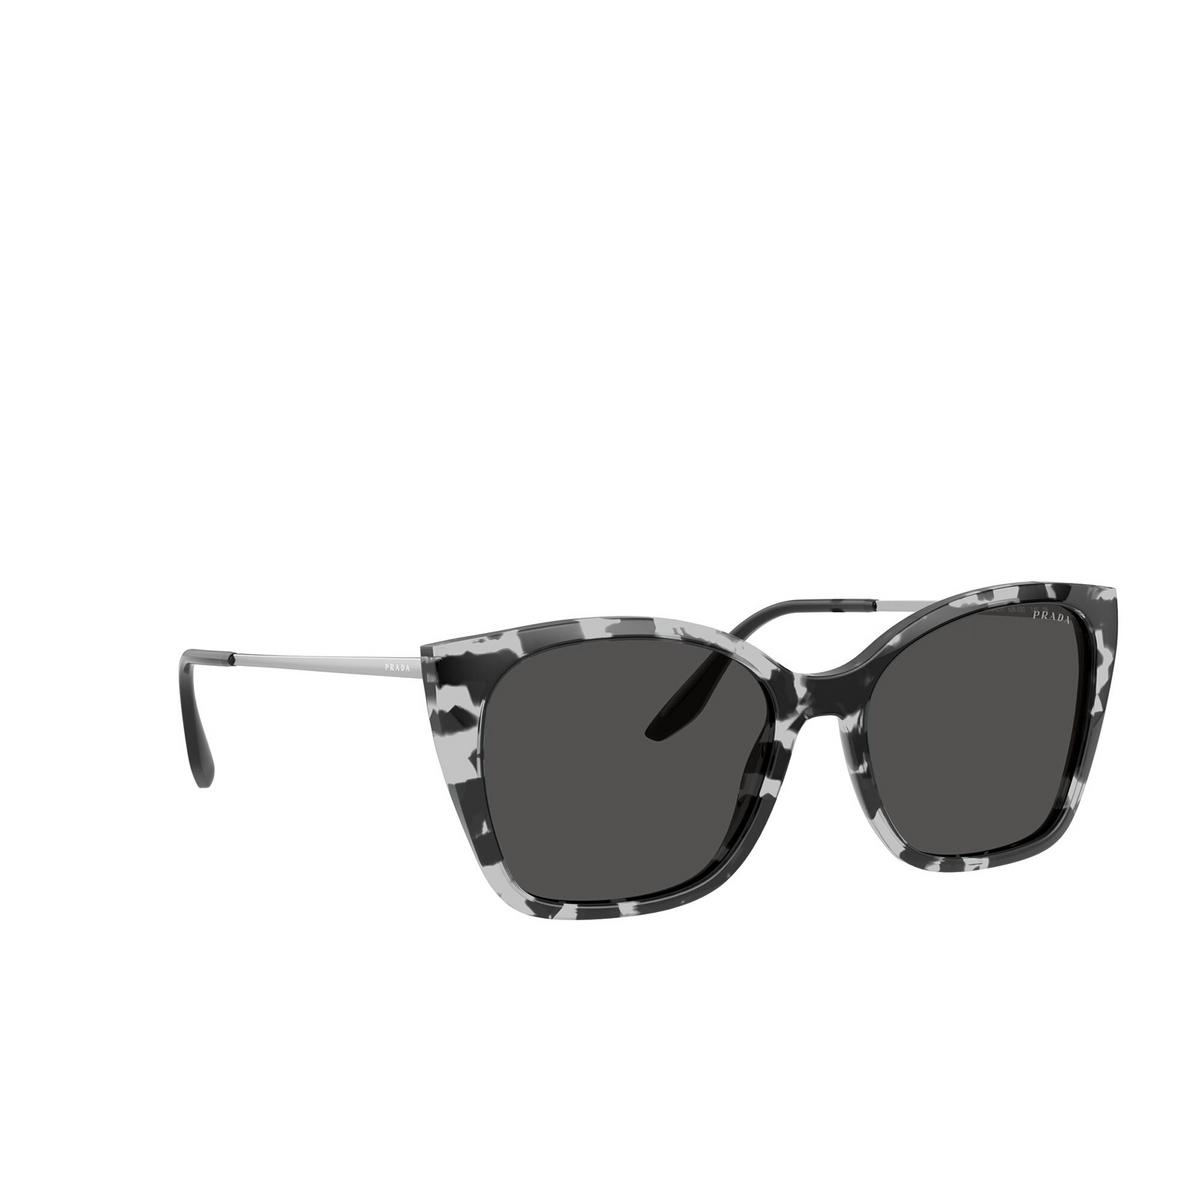 Prada® Cat-eye Sunglasses: PR 12XS color Grey Tortoise 5285S0 - three-quarters view.